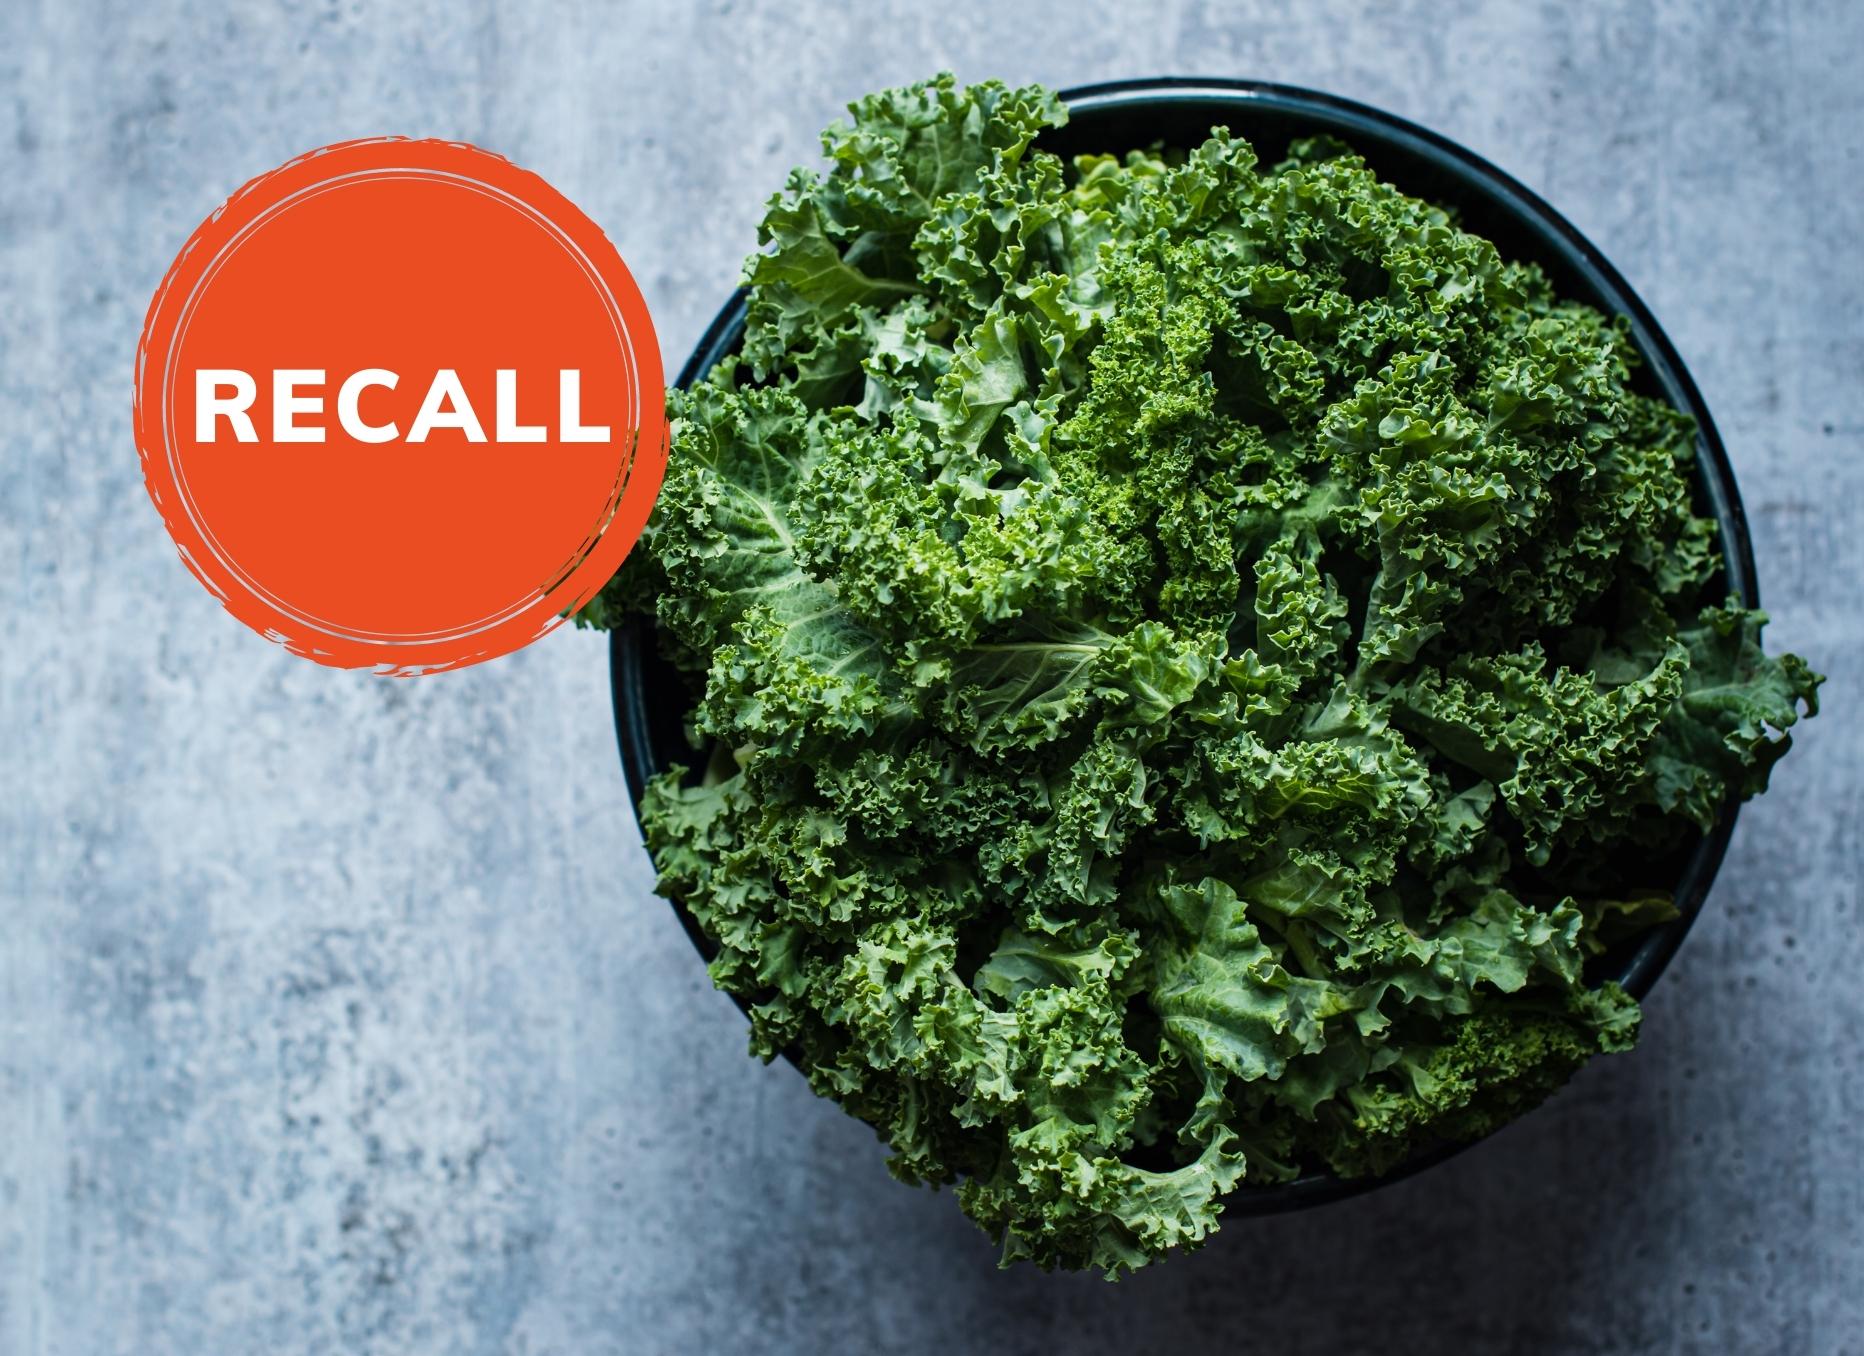 Kale Recall